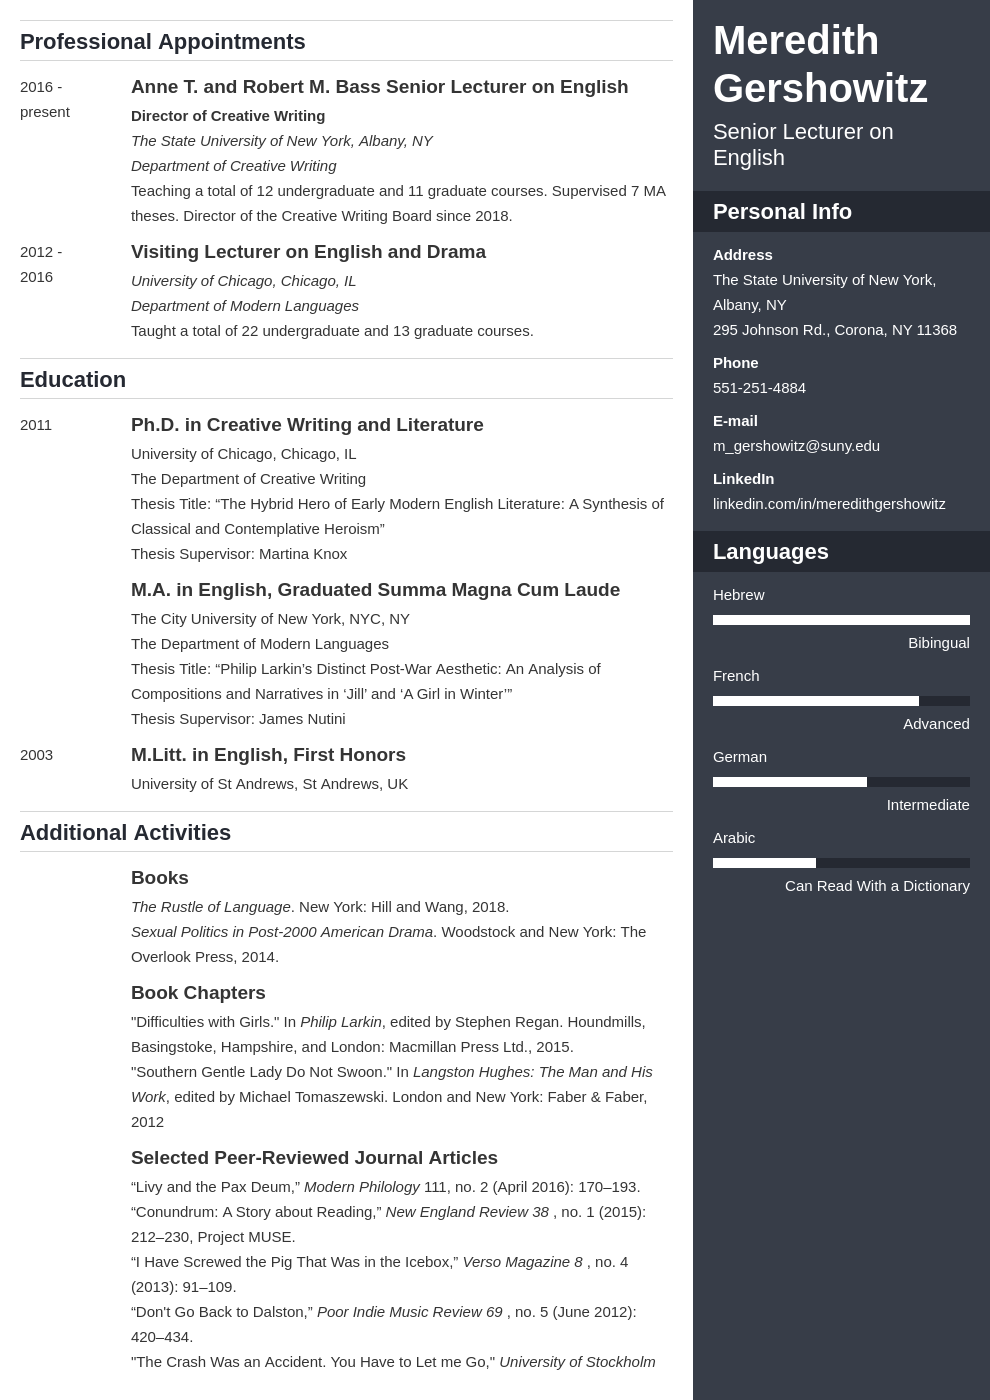 cv academic template enfold uk